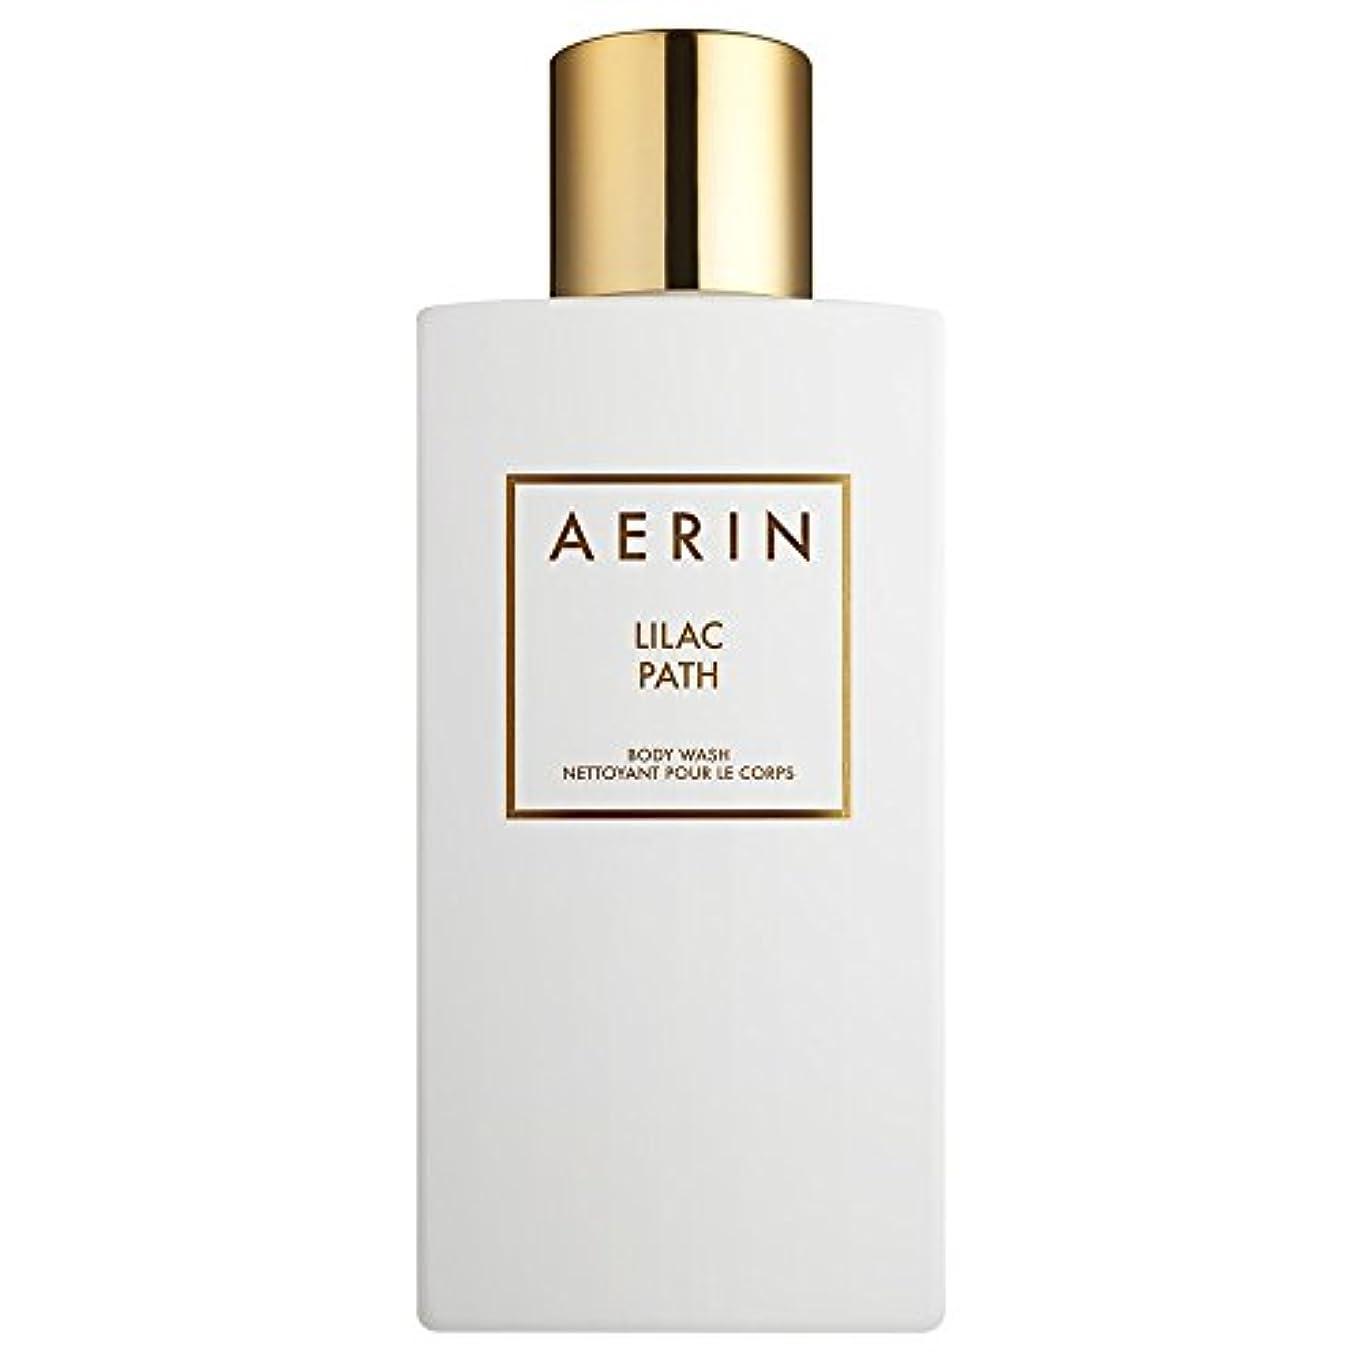 Aerinライラックパスボディウォッシュ225ミリリットル (AERIN) (x2) - AERIN Lilac Path Bodywash 225ml (Pack of 2) [並行輸入品]